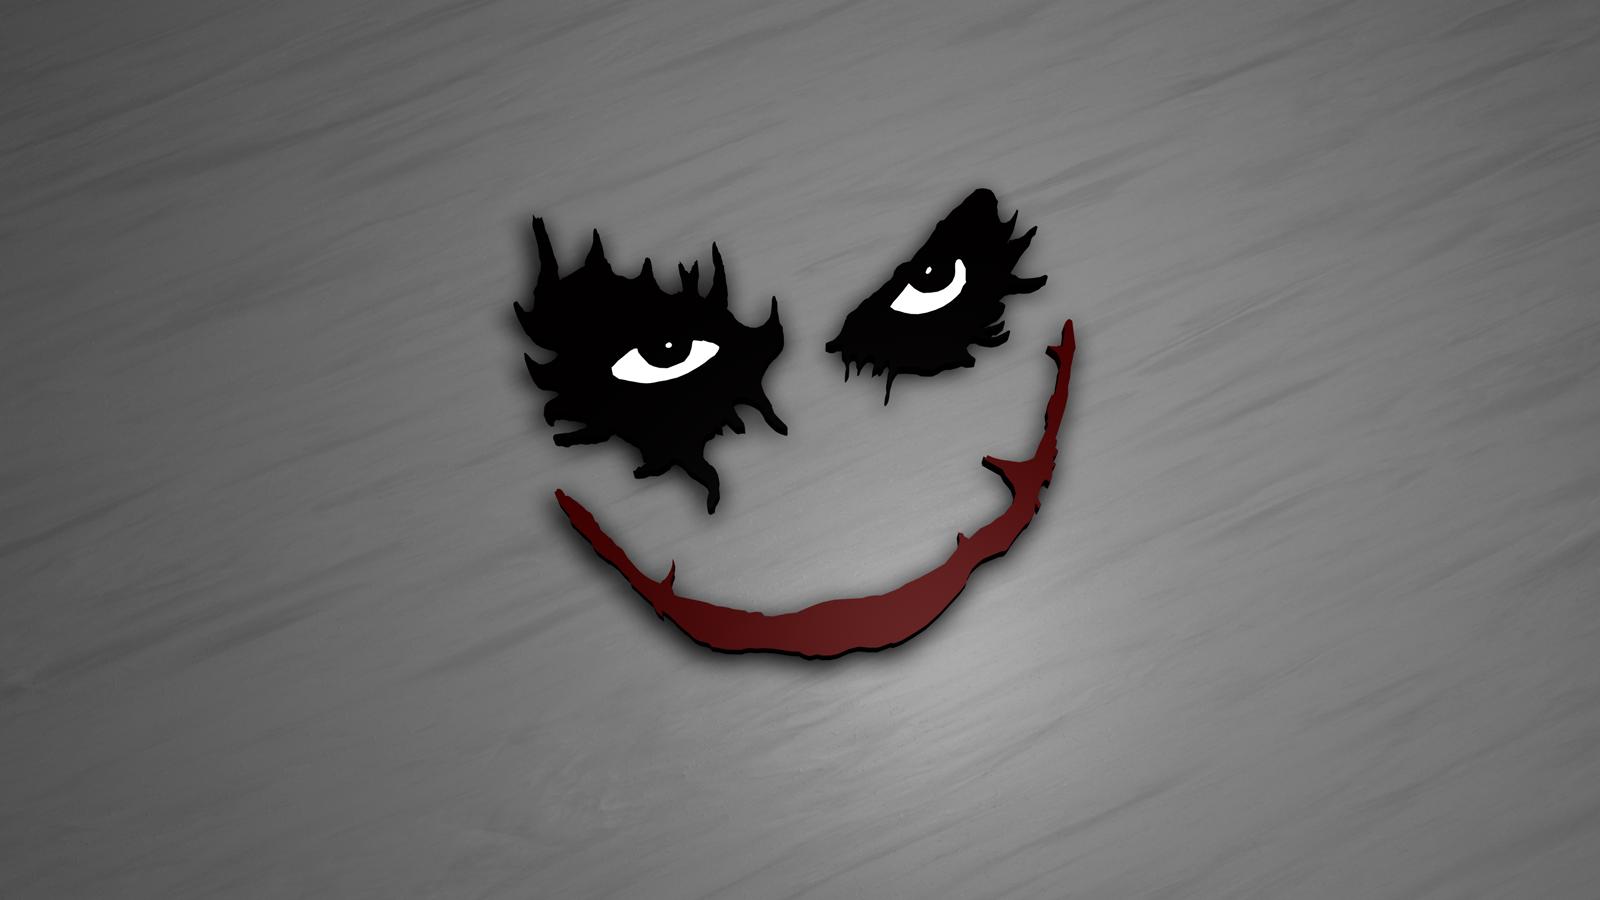 Unknown Artist The Joker Gets Trumped